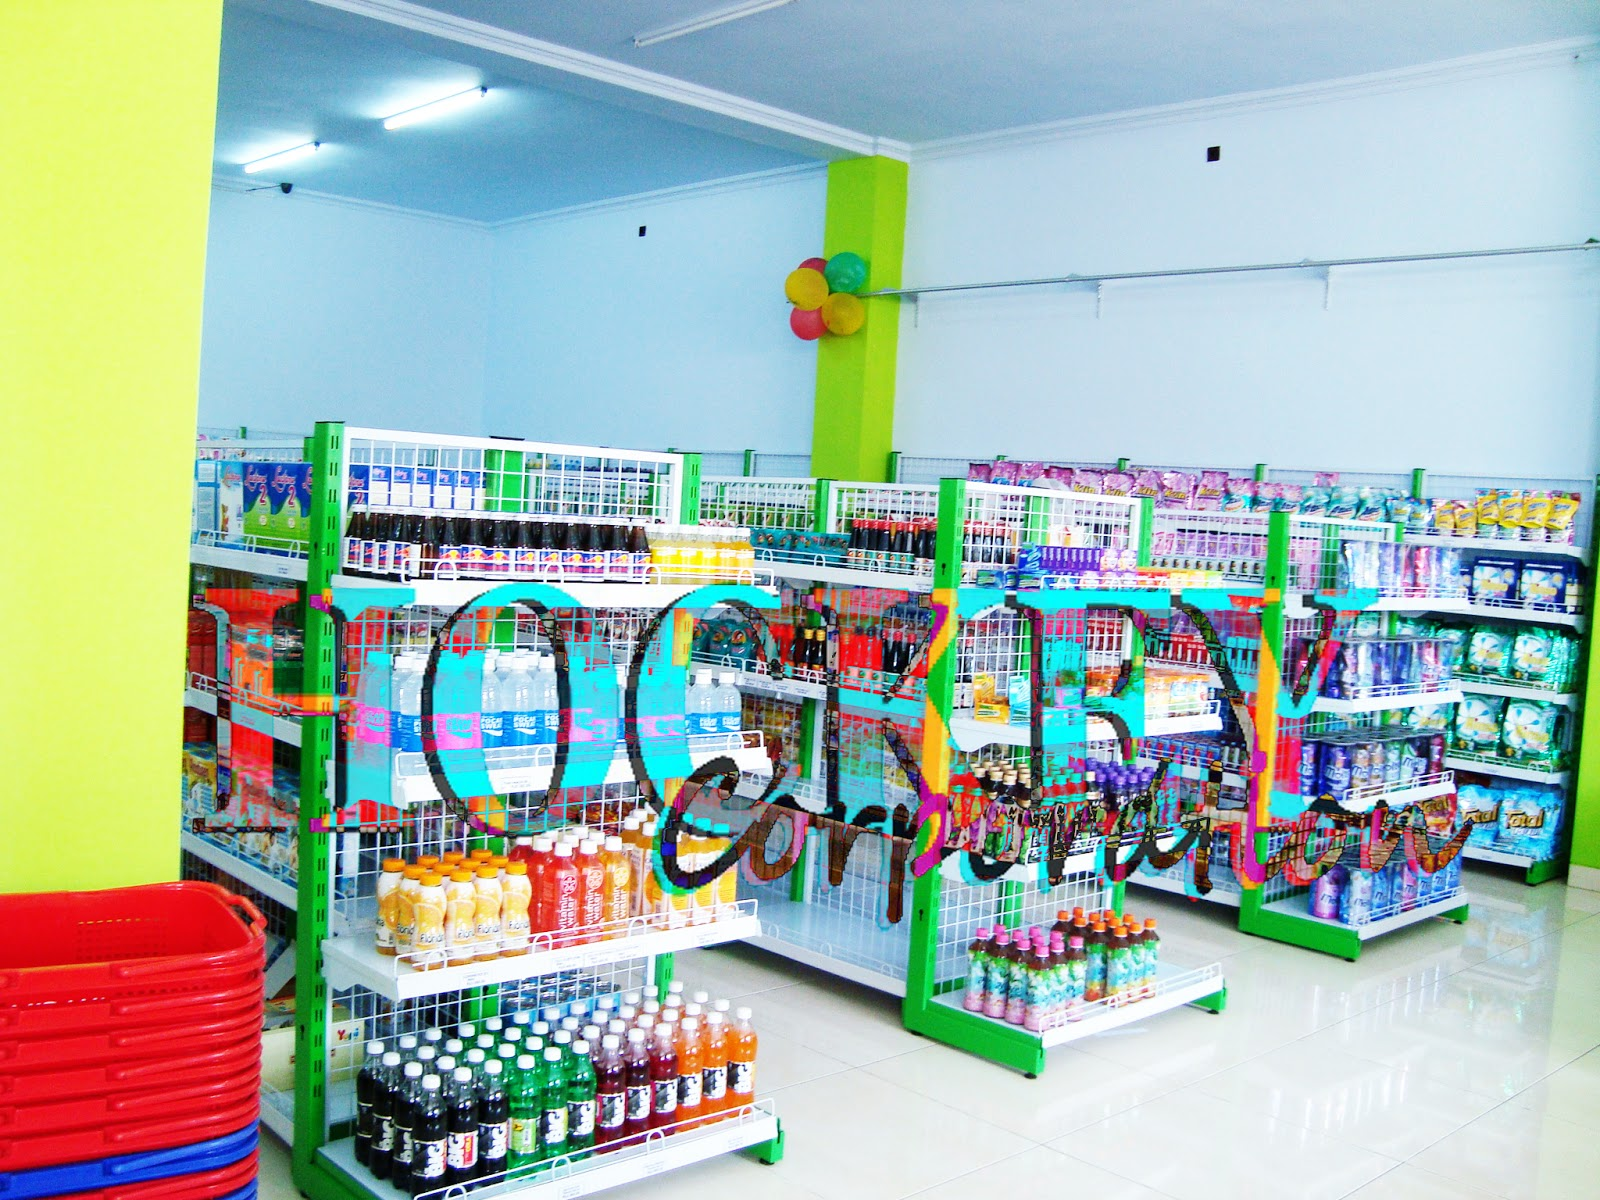 minimarket, murah, rak, RAK MINIMARKET, rak minimarket murah, RAK SUPERMARKET, rak supermarket murah, RAK TOKO, rak toko murah, supermarket, toko